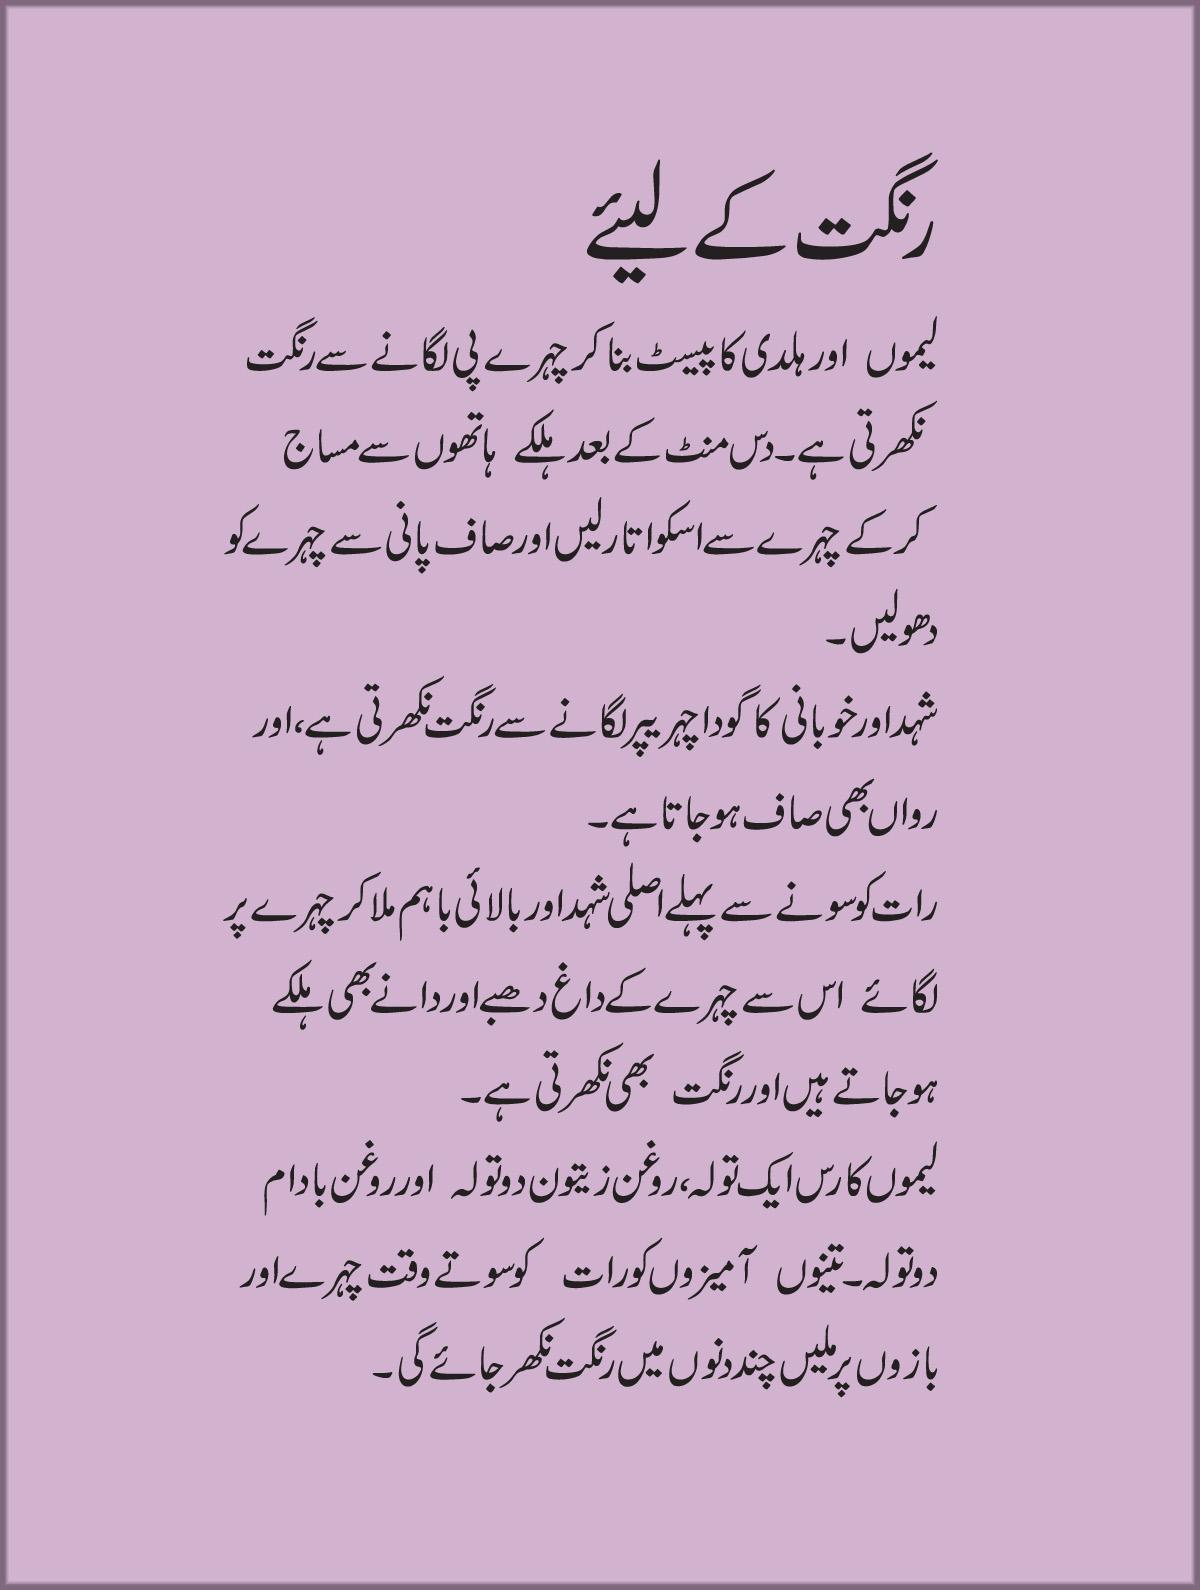 Skin Whitening Tips In Urdu And Hindiskin Urduskin